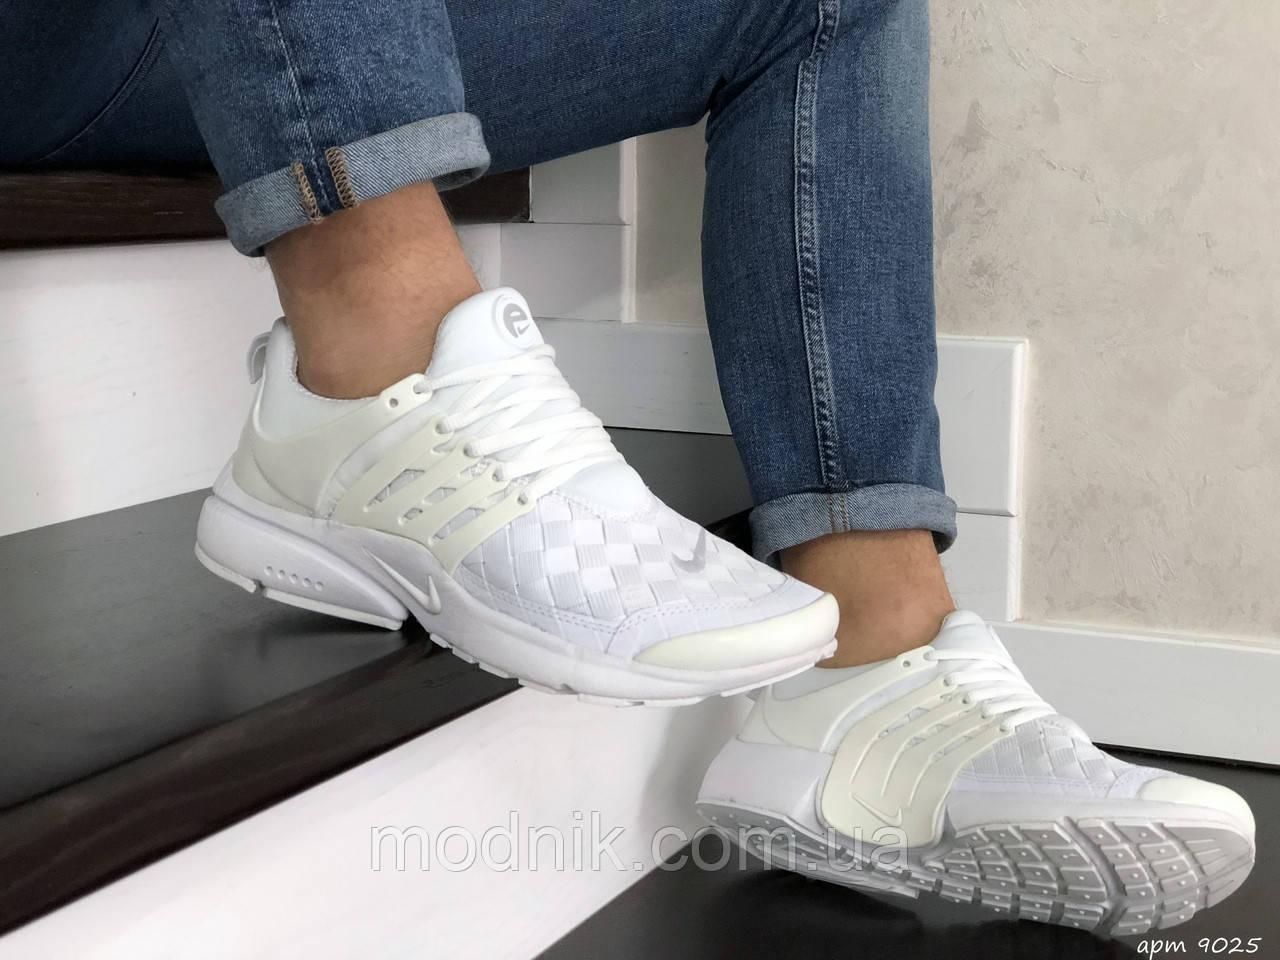 Мужские кроссовки Nike Air Presto TP QS (белые) 9025